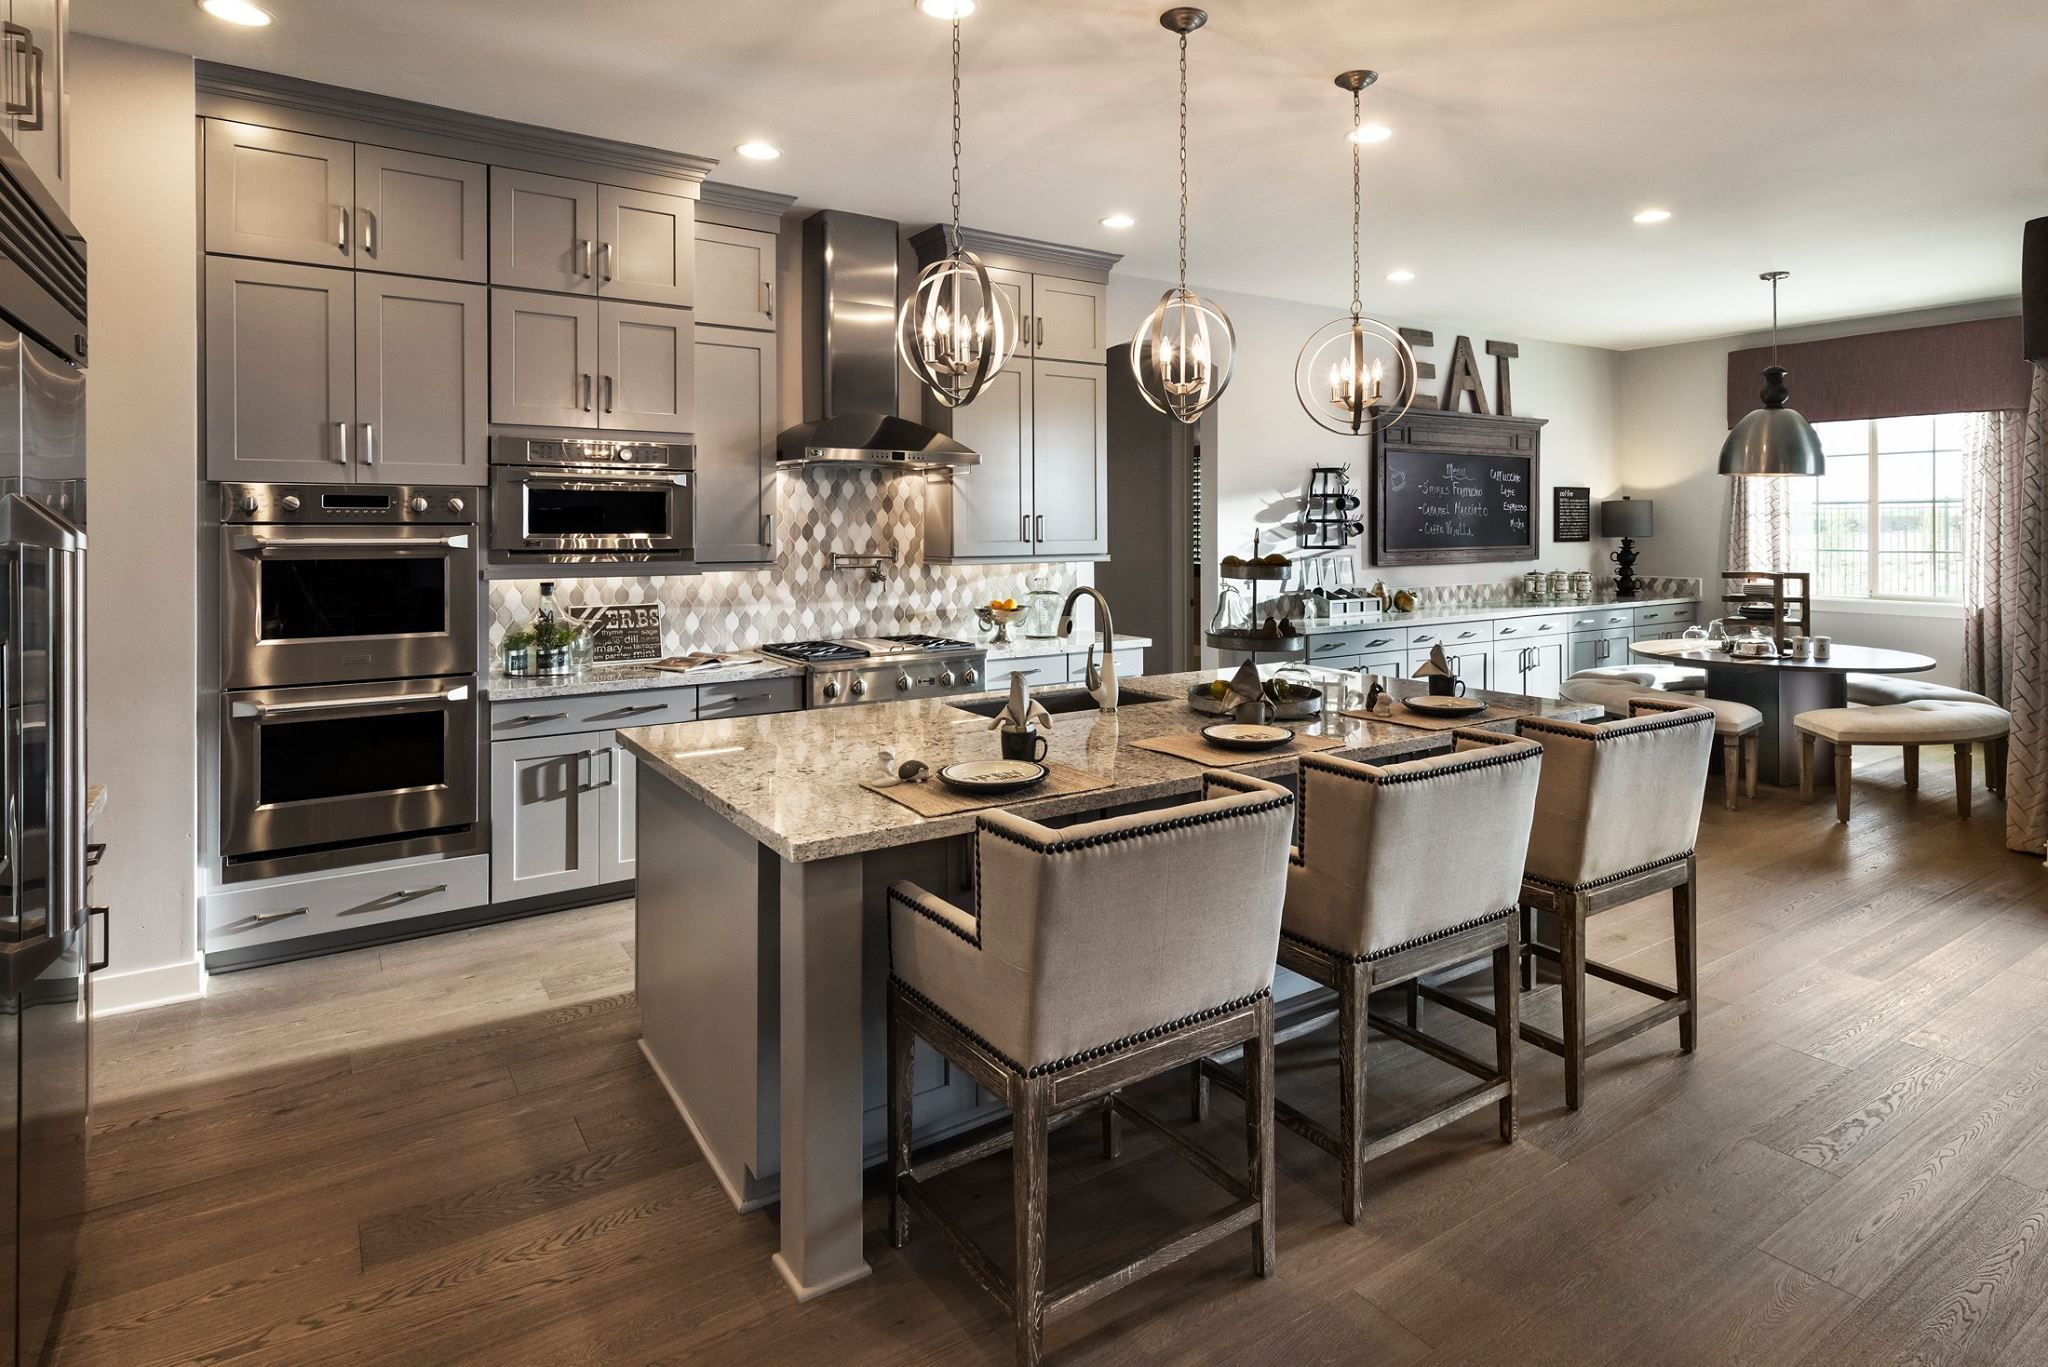 Image result for best kitchens 2018 gray Kitchen design